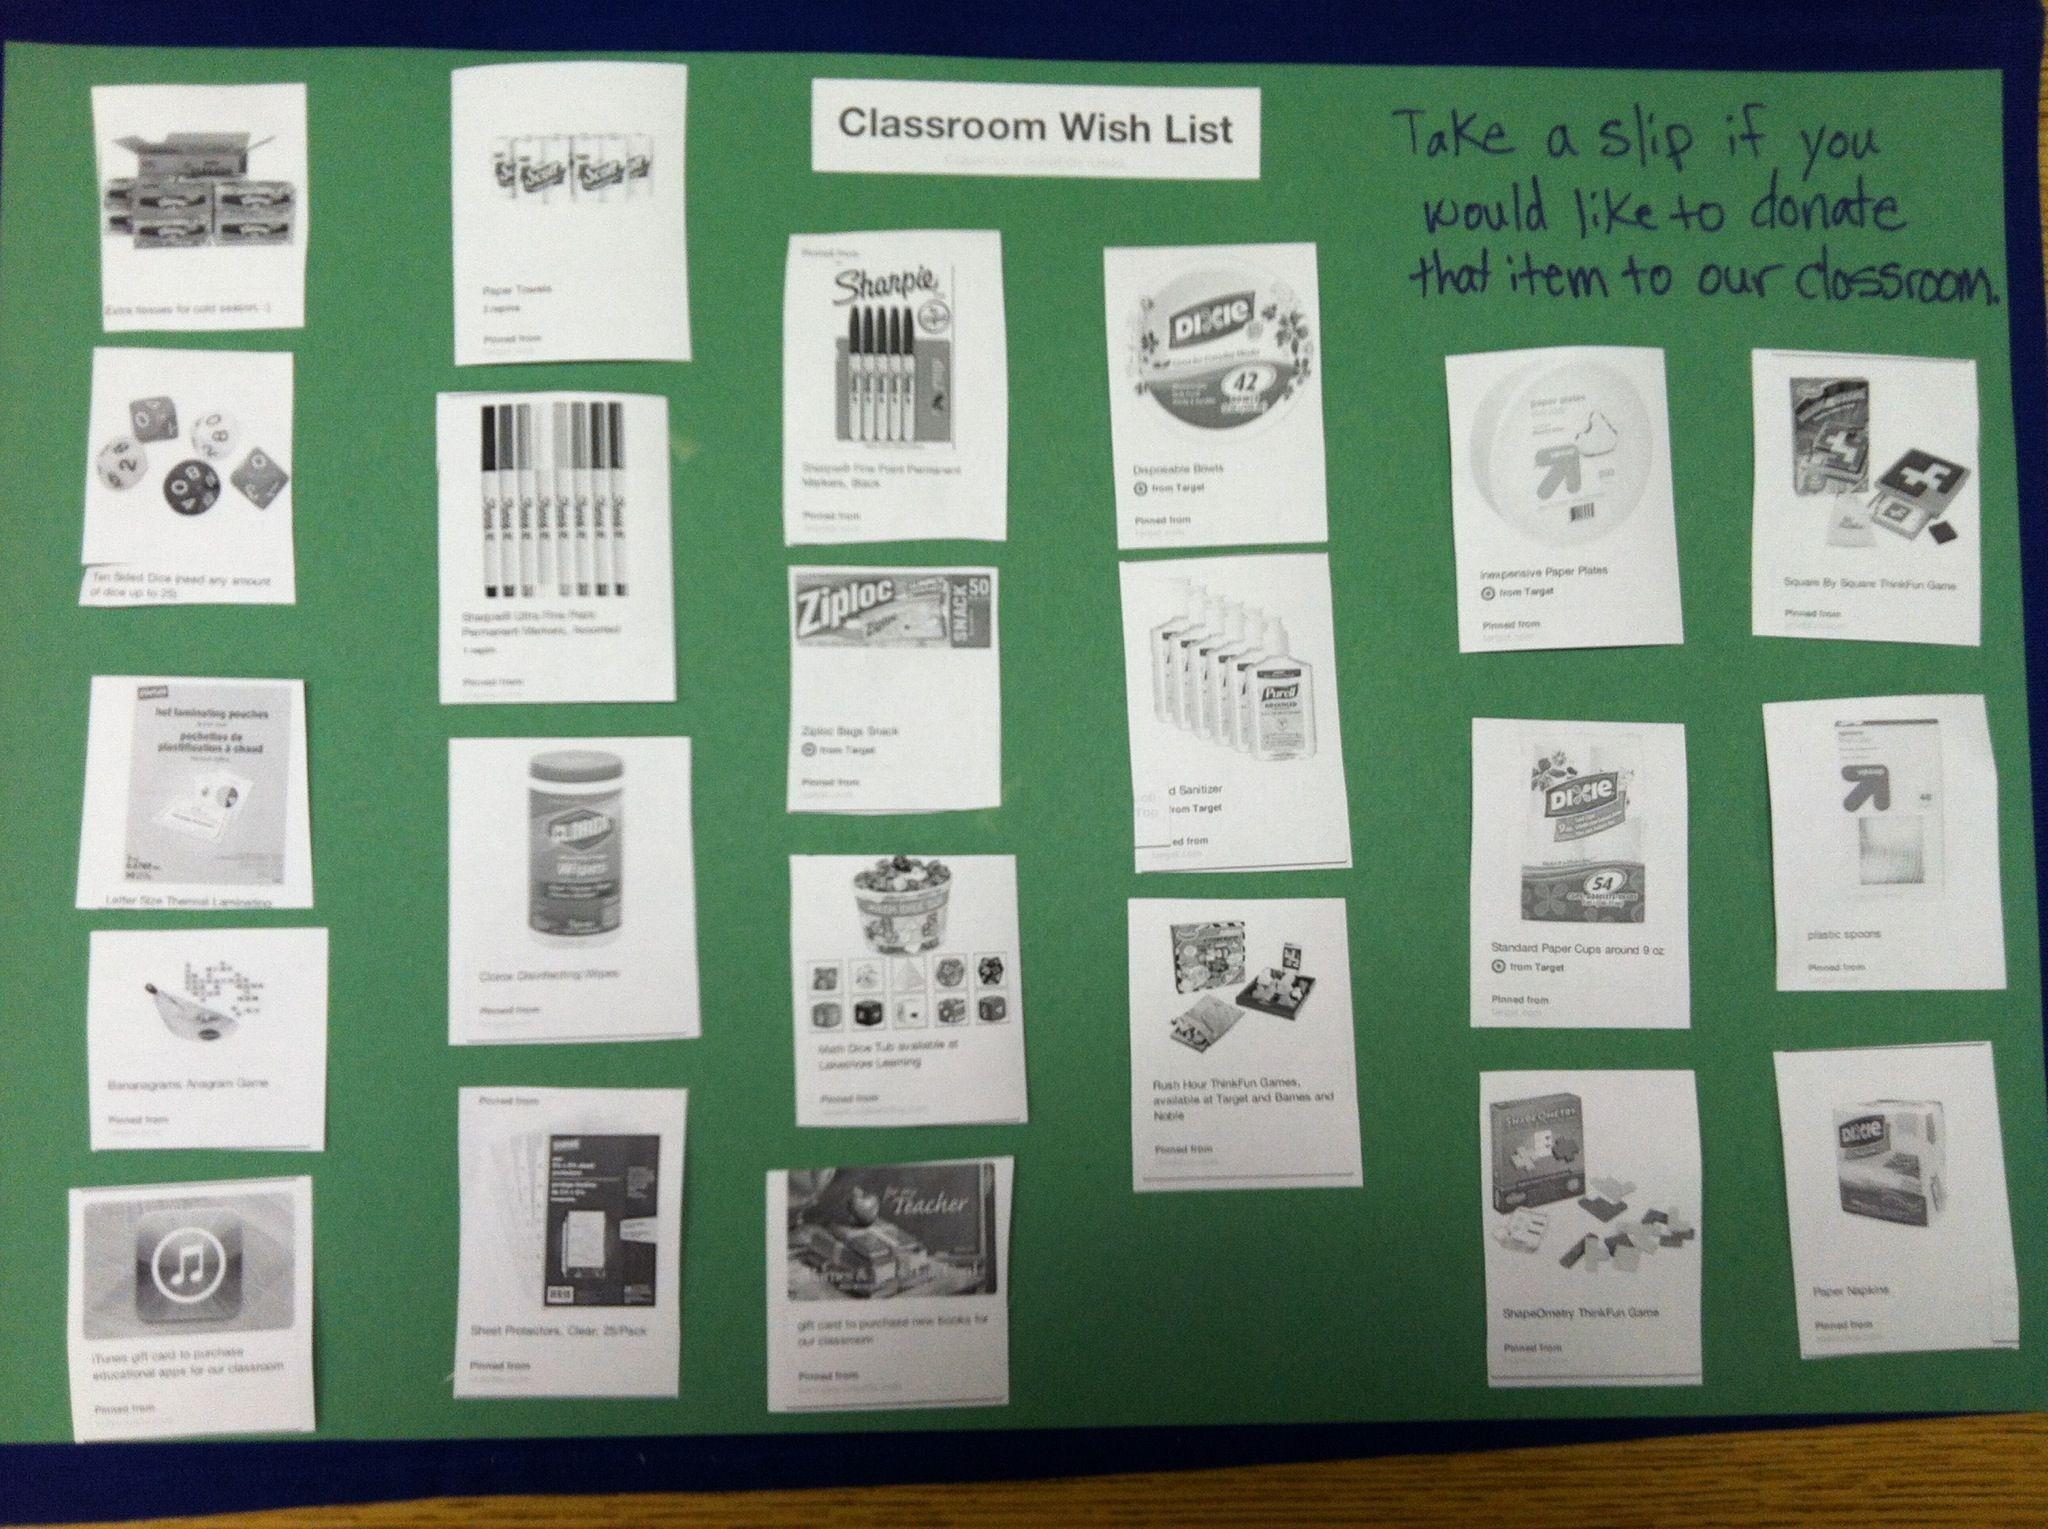 Classroom Wish List Ideas : Classroom wish list create a wish list board and ems you d